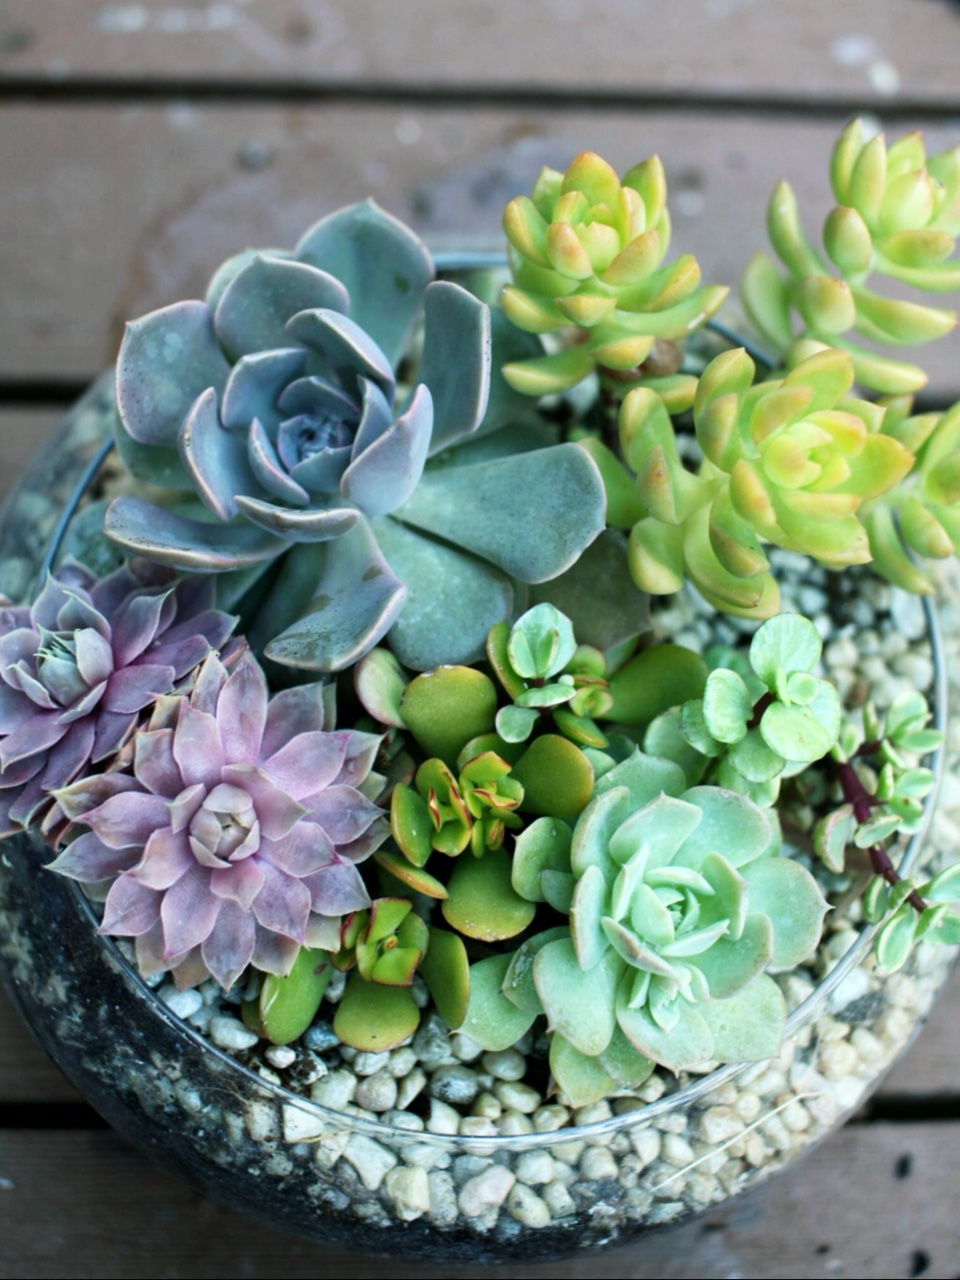 Plant Night Diy Succulent Garden Dish Saratoga Paint And Sip Studio